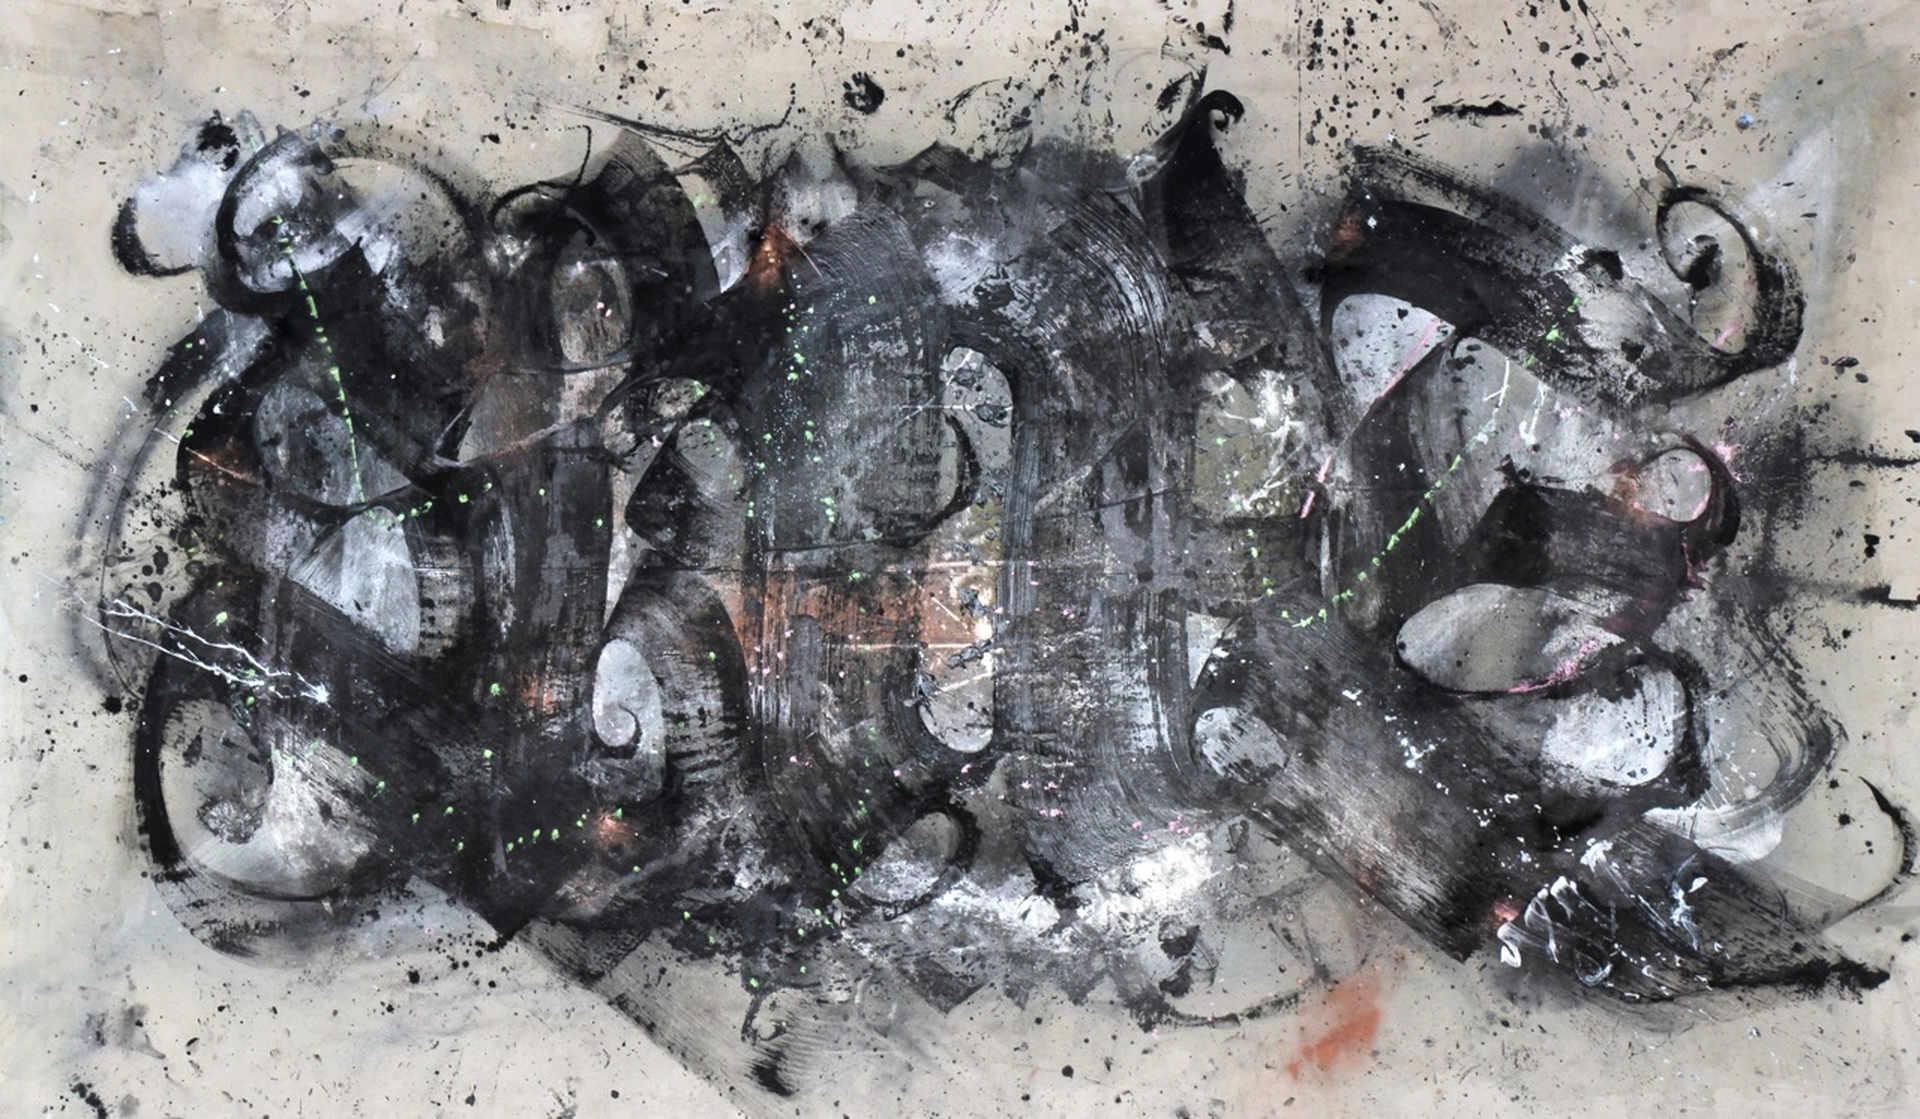 Niels Shoe Meulman - Damage and Disgrace,